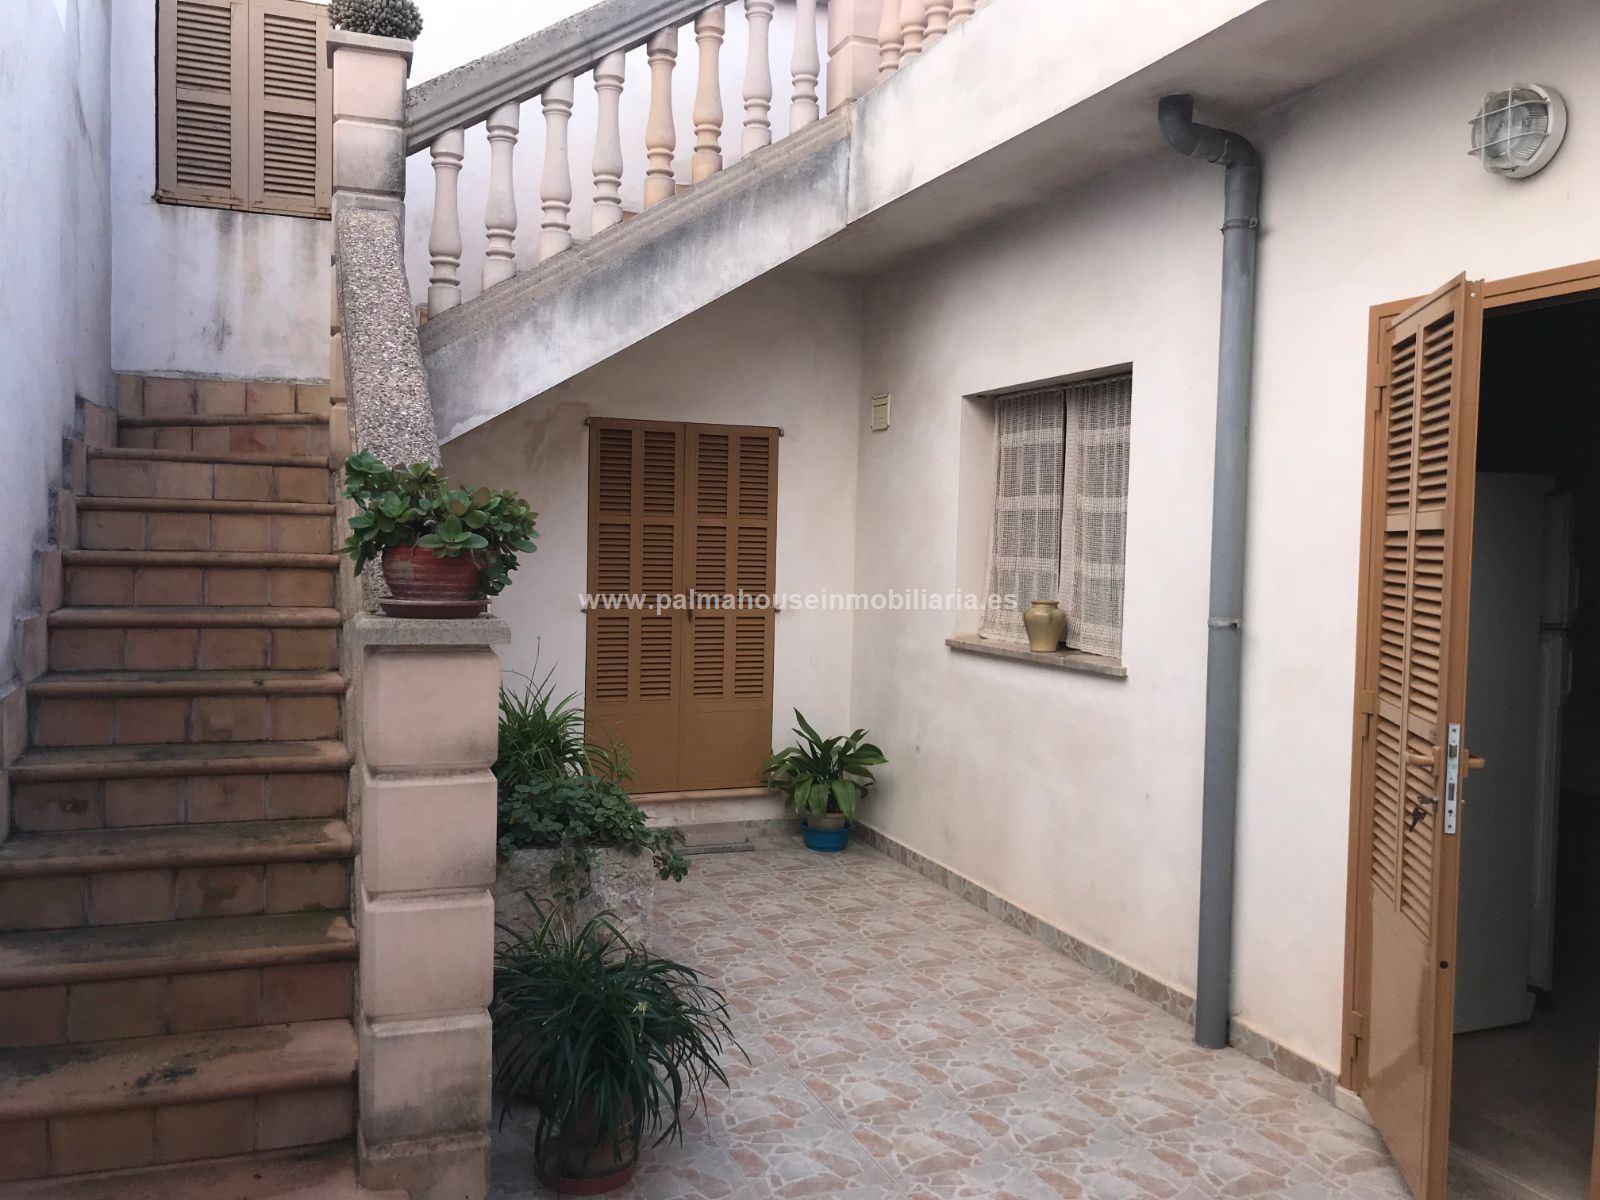 Casa  Santa margalida - santa margarita